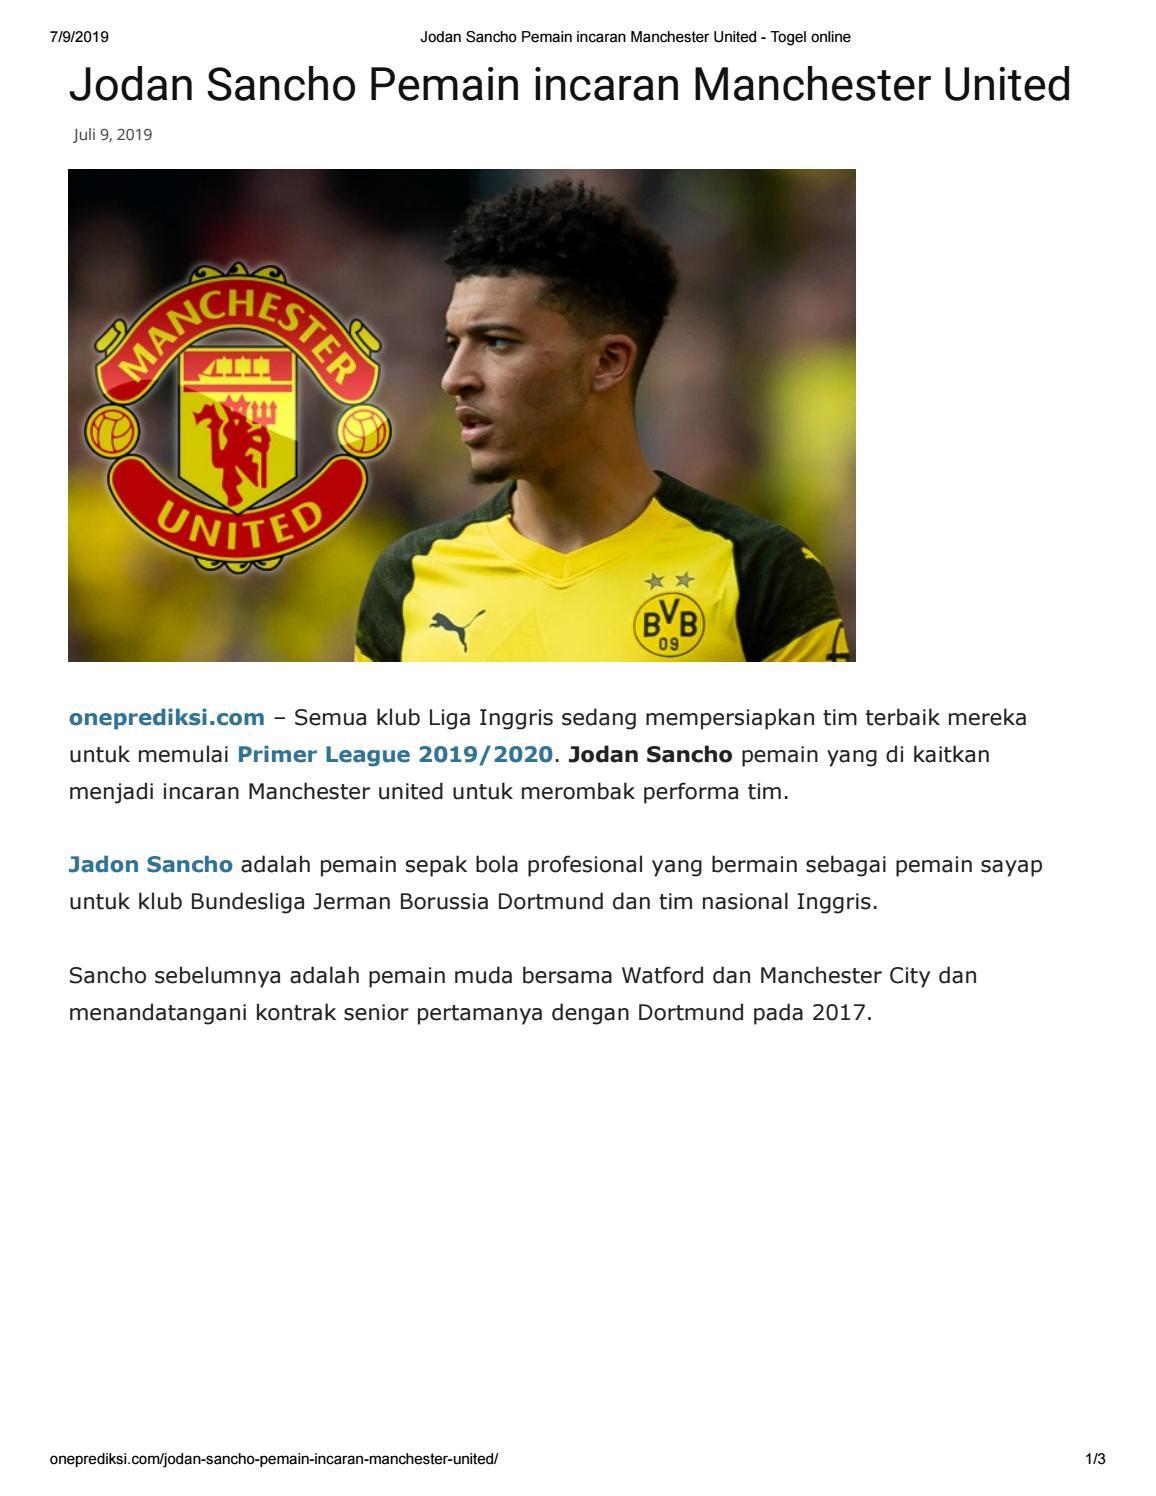 Jodan Sancho Pemain Incaran Manchester United By